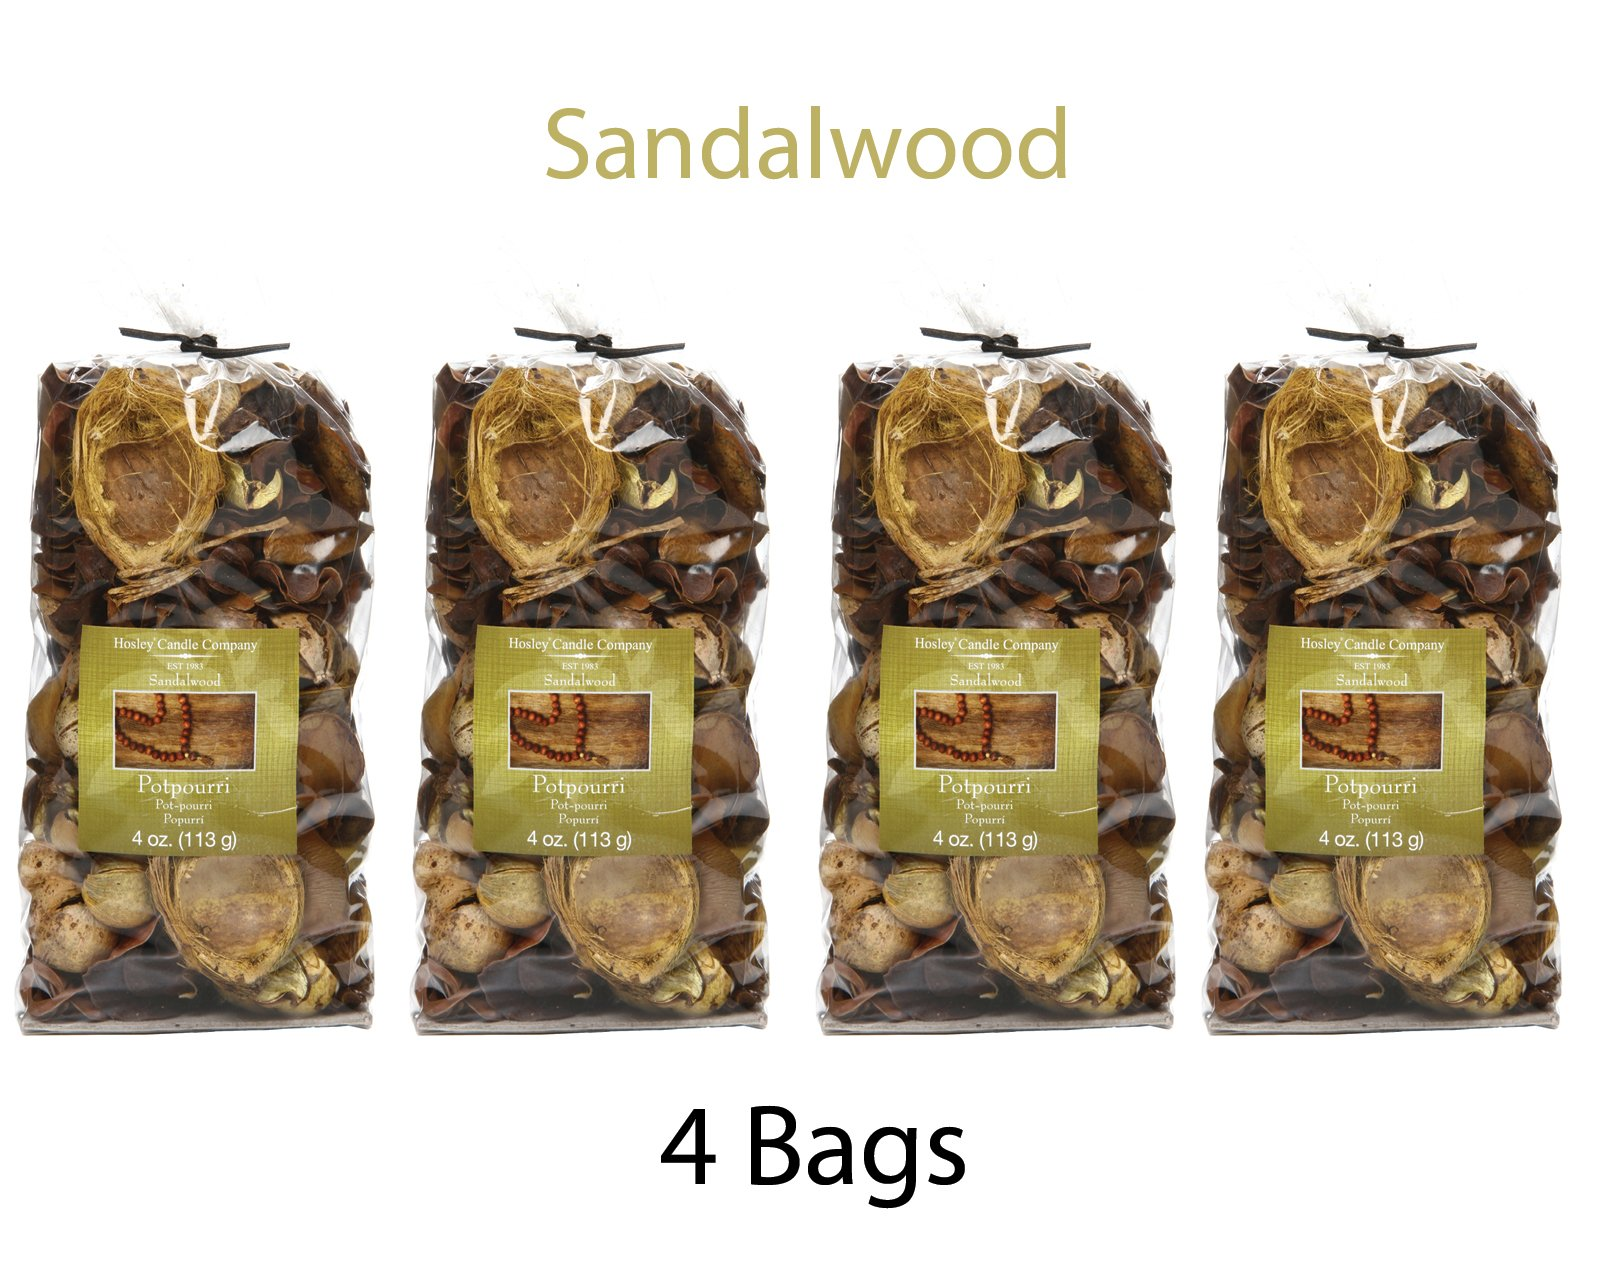 Hosley Set of 4 Sandalwood Scented, Natural Potpourri Bag -4 oz each. Infused Essential Oils. Ideal Weddings, Spa, Reiki, Meditation Settings, Bulk Buy O4